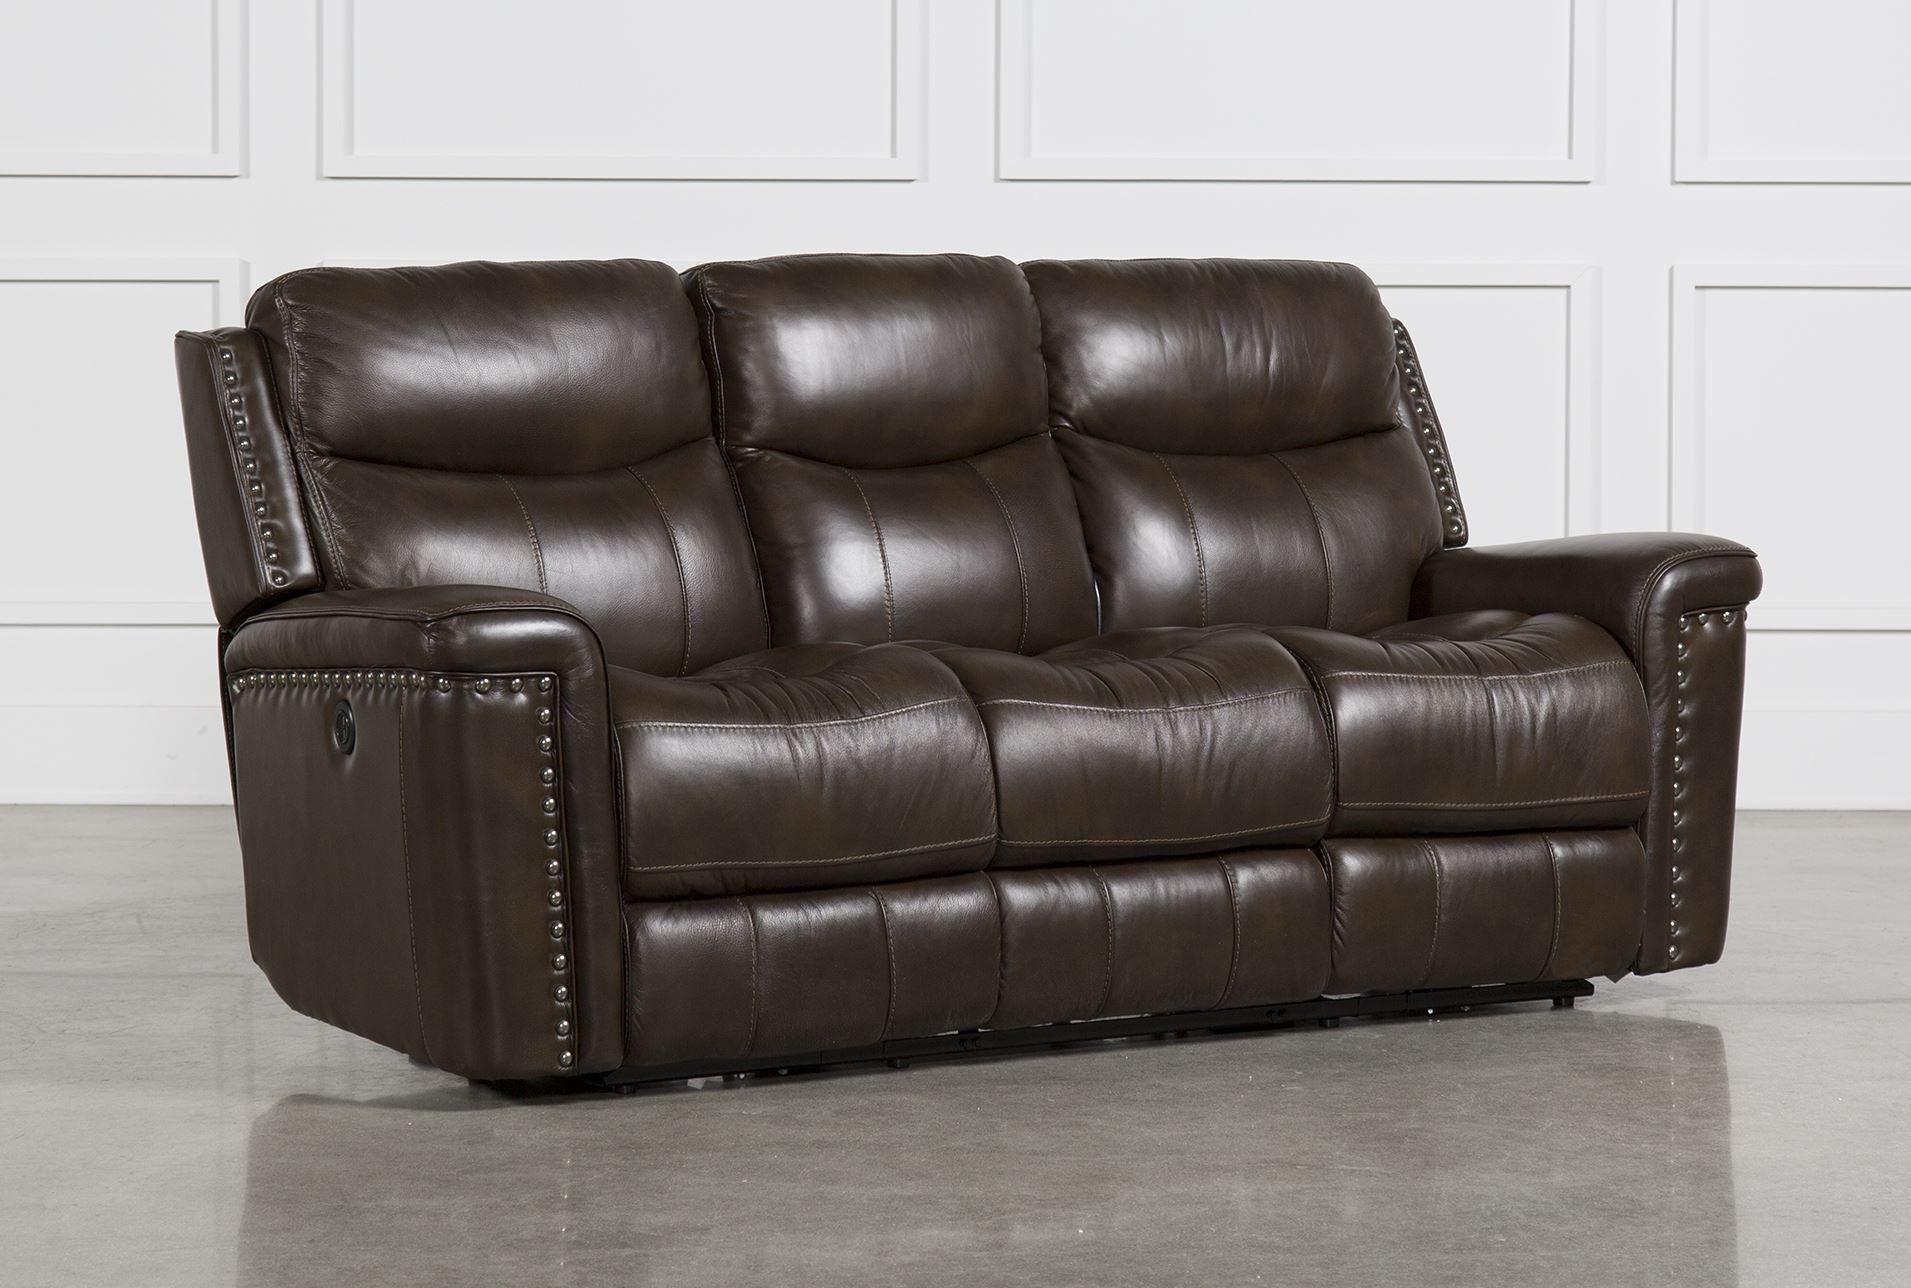 Bowman Power Reclining Sofa Sofa Reclining Sofa Living Room Designs